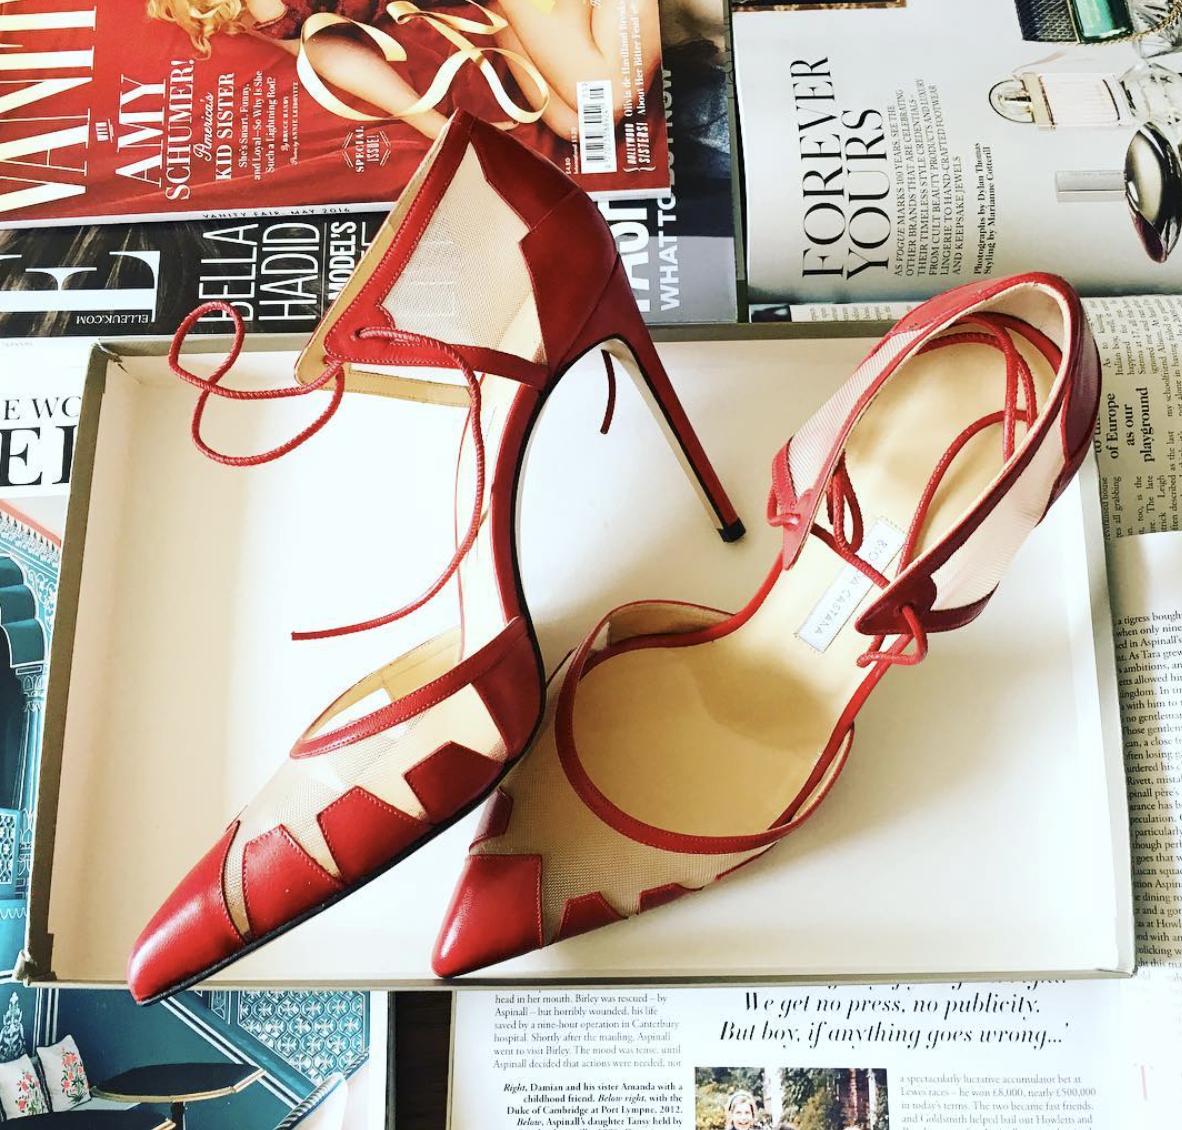 @ lolalizzyb   Some like it hot 🔥  #shoesday  #girlinbc   #biondacastana   #redhot   #scorchio   #summer   #shoesoftheday   #stylediaries   #london